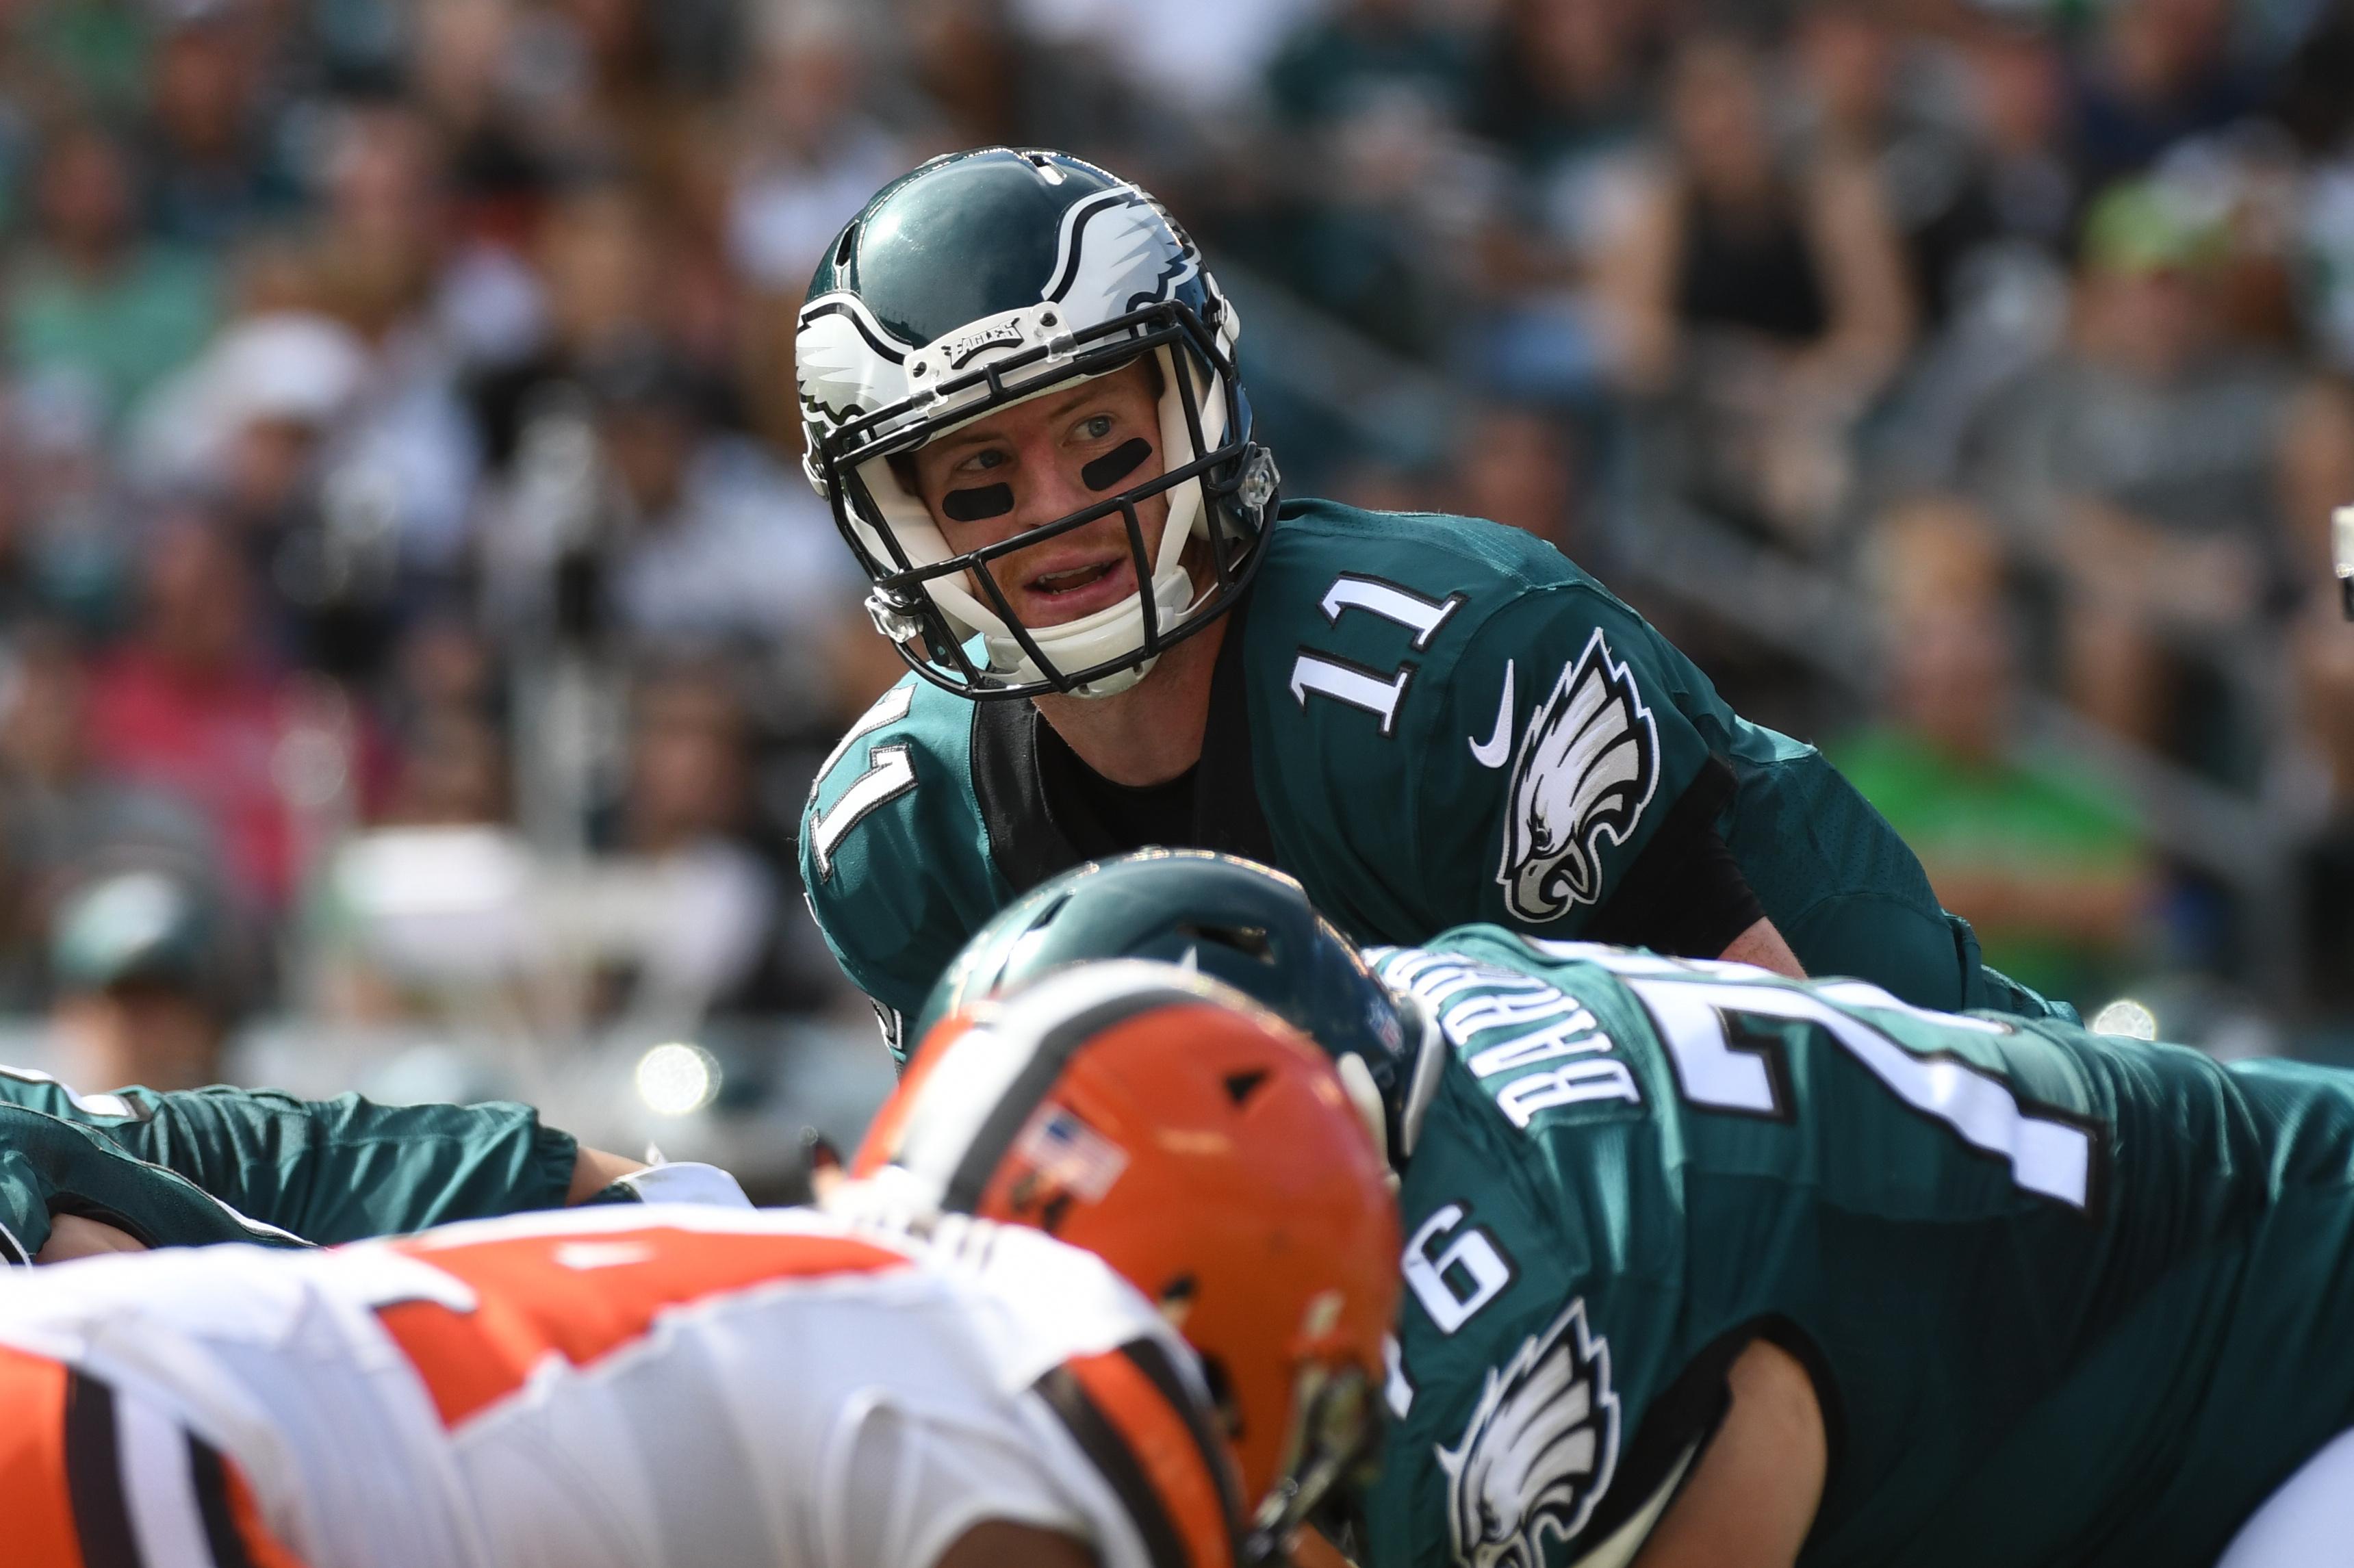 NFL: SEP 11 Browns at Eagles